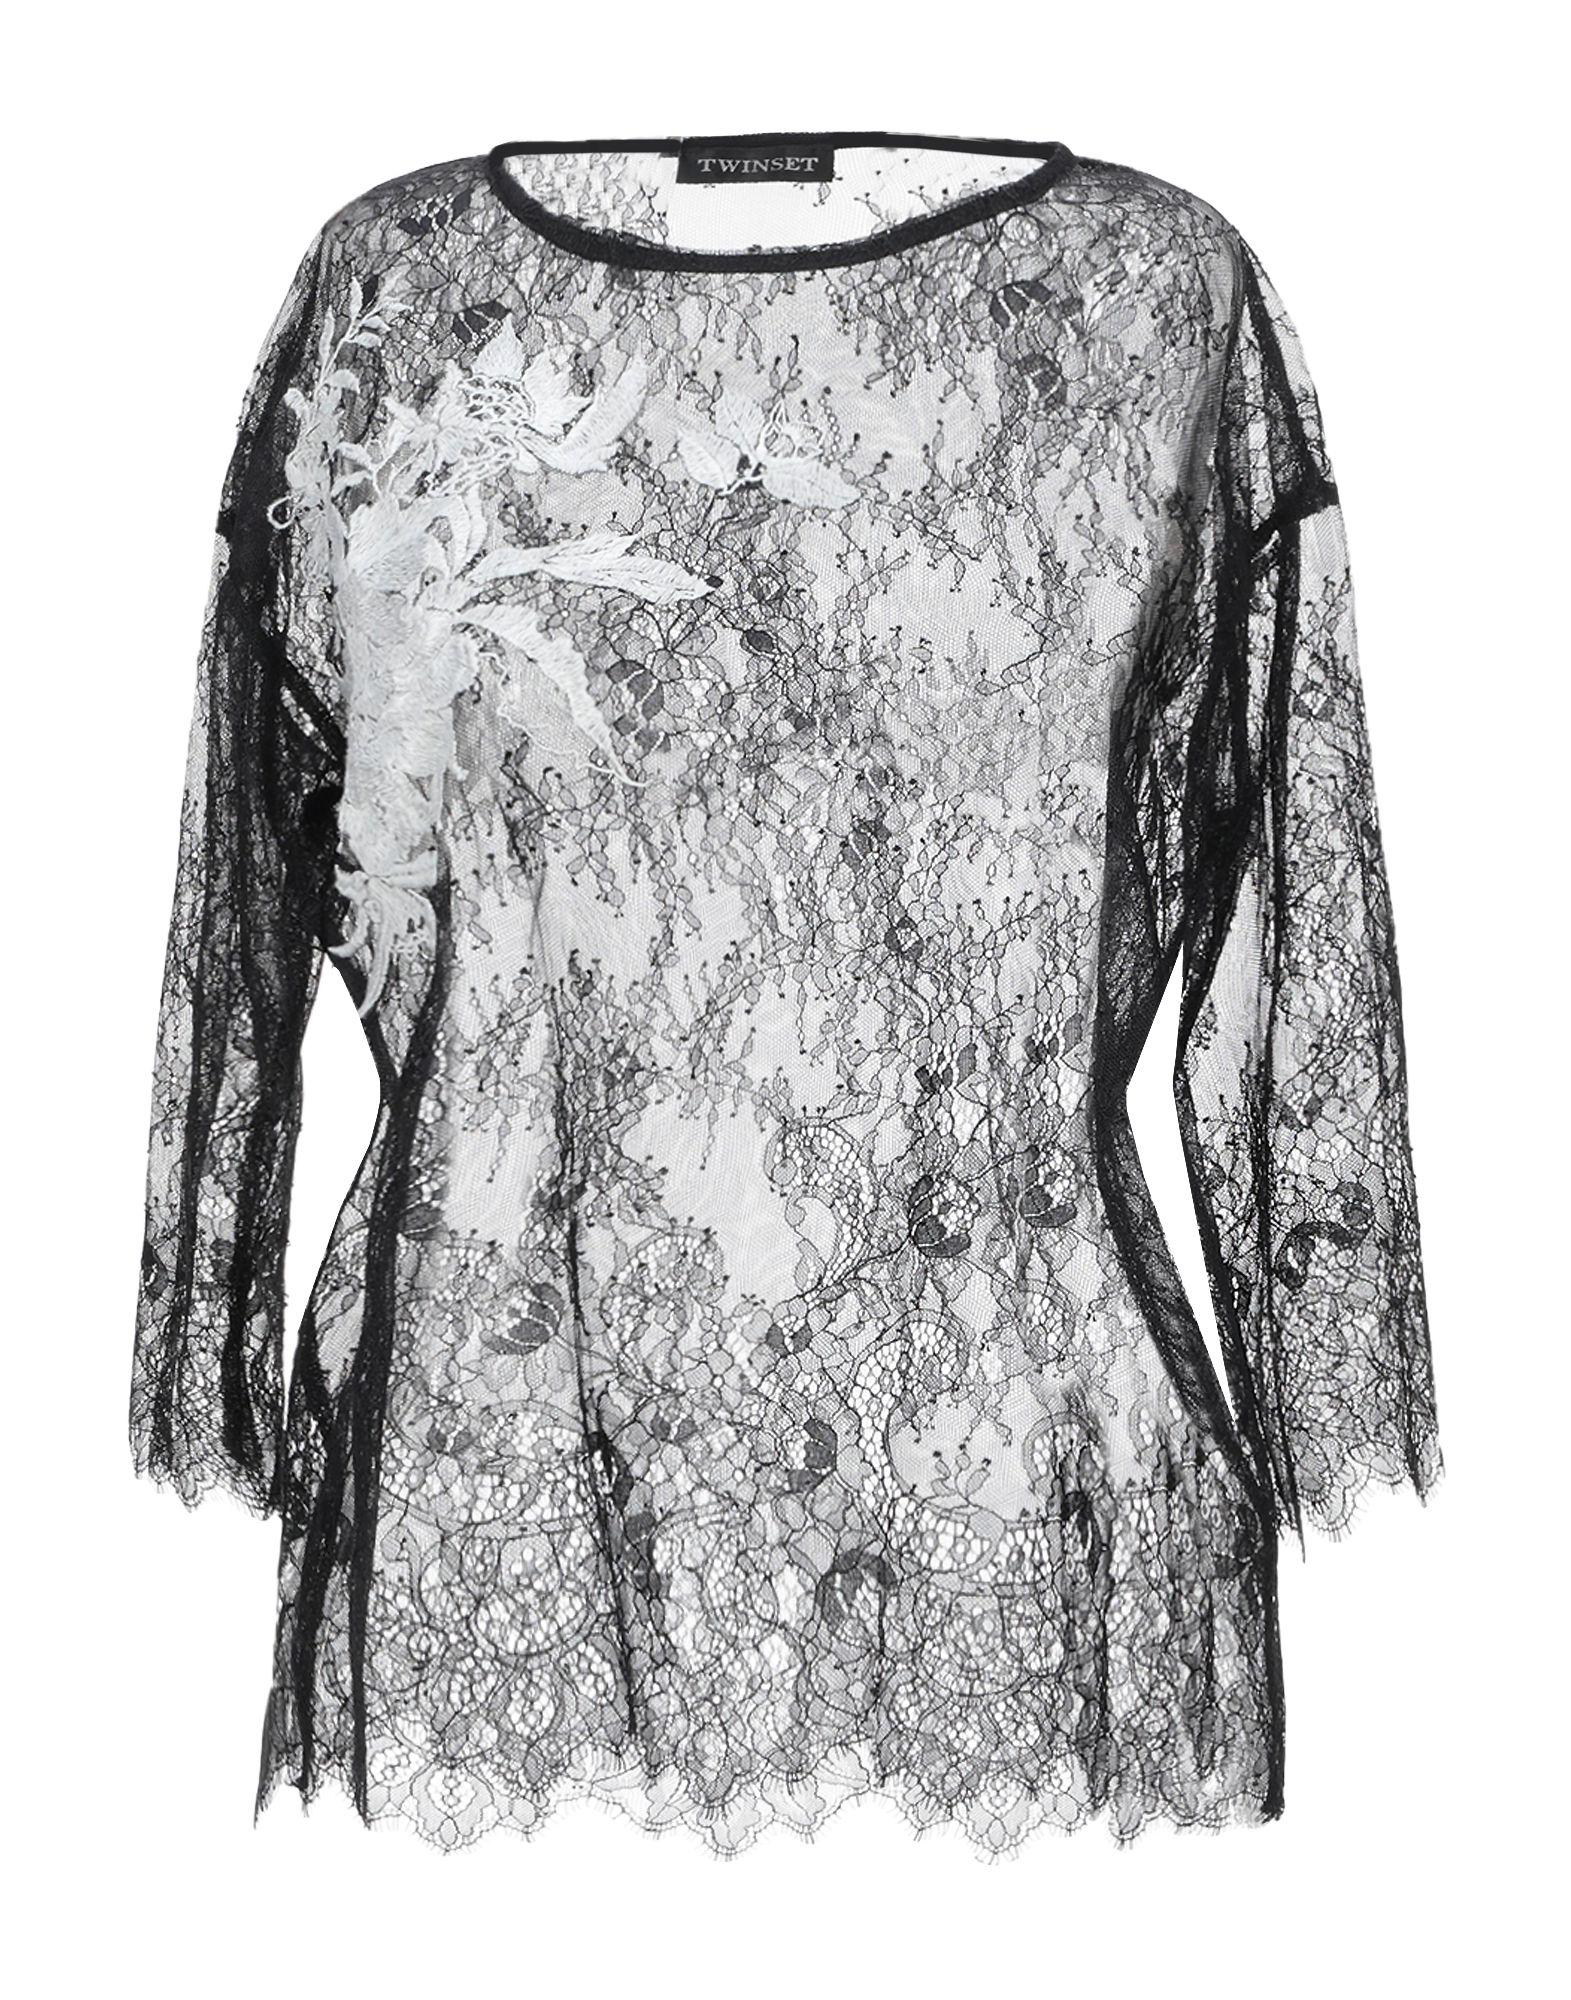 TWINSET Блузка twinset блузка